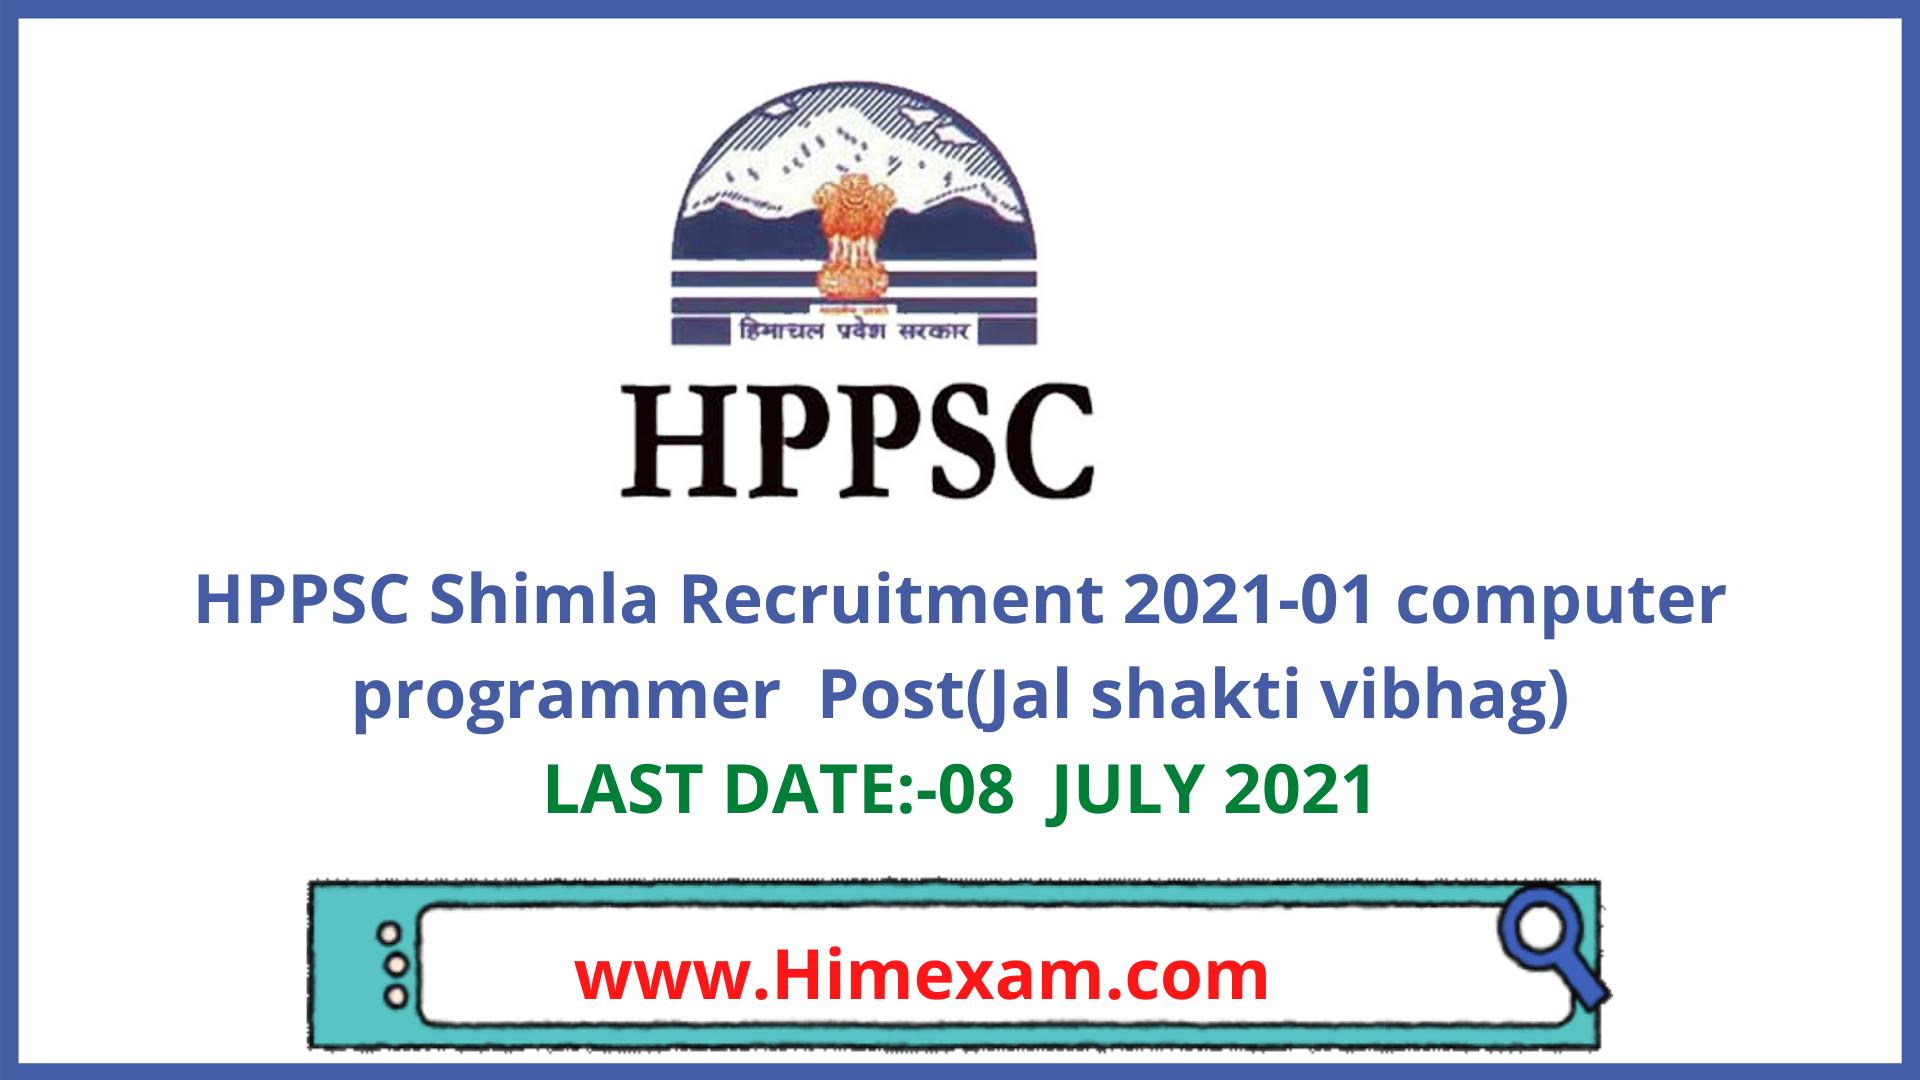 HPPSC Shimla Recruitment 2021-01 computer programmer  Post(Jal shakti vibhag)